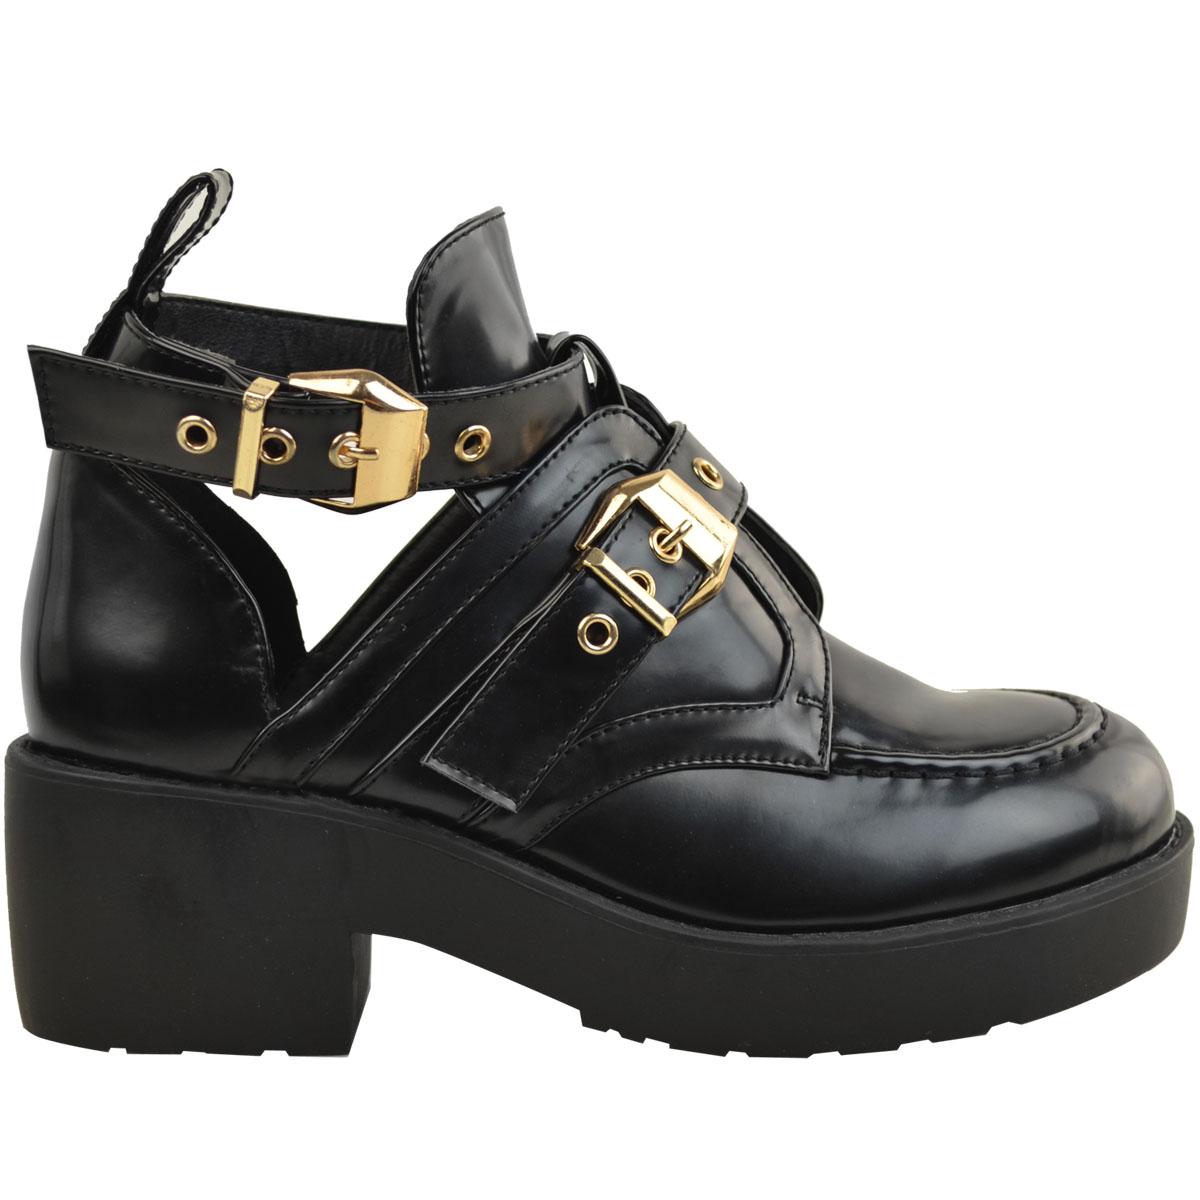 Womens Black Winter Chelsea Ankle Boots Low Block Heel Bargain Price Ladies New